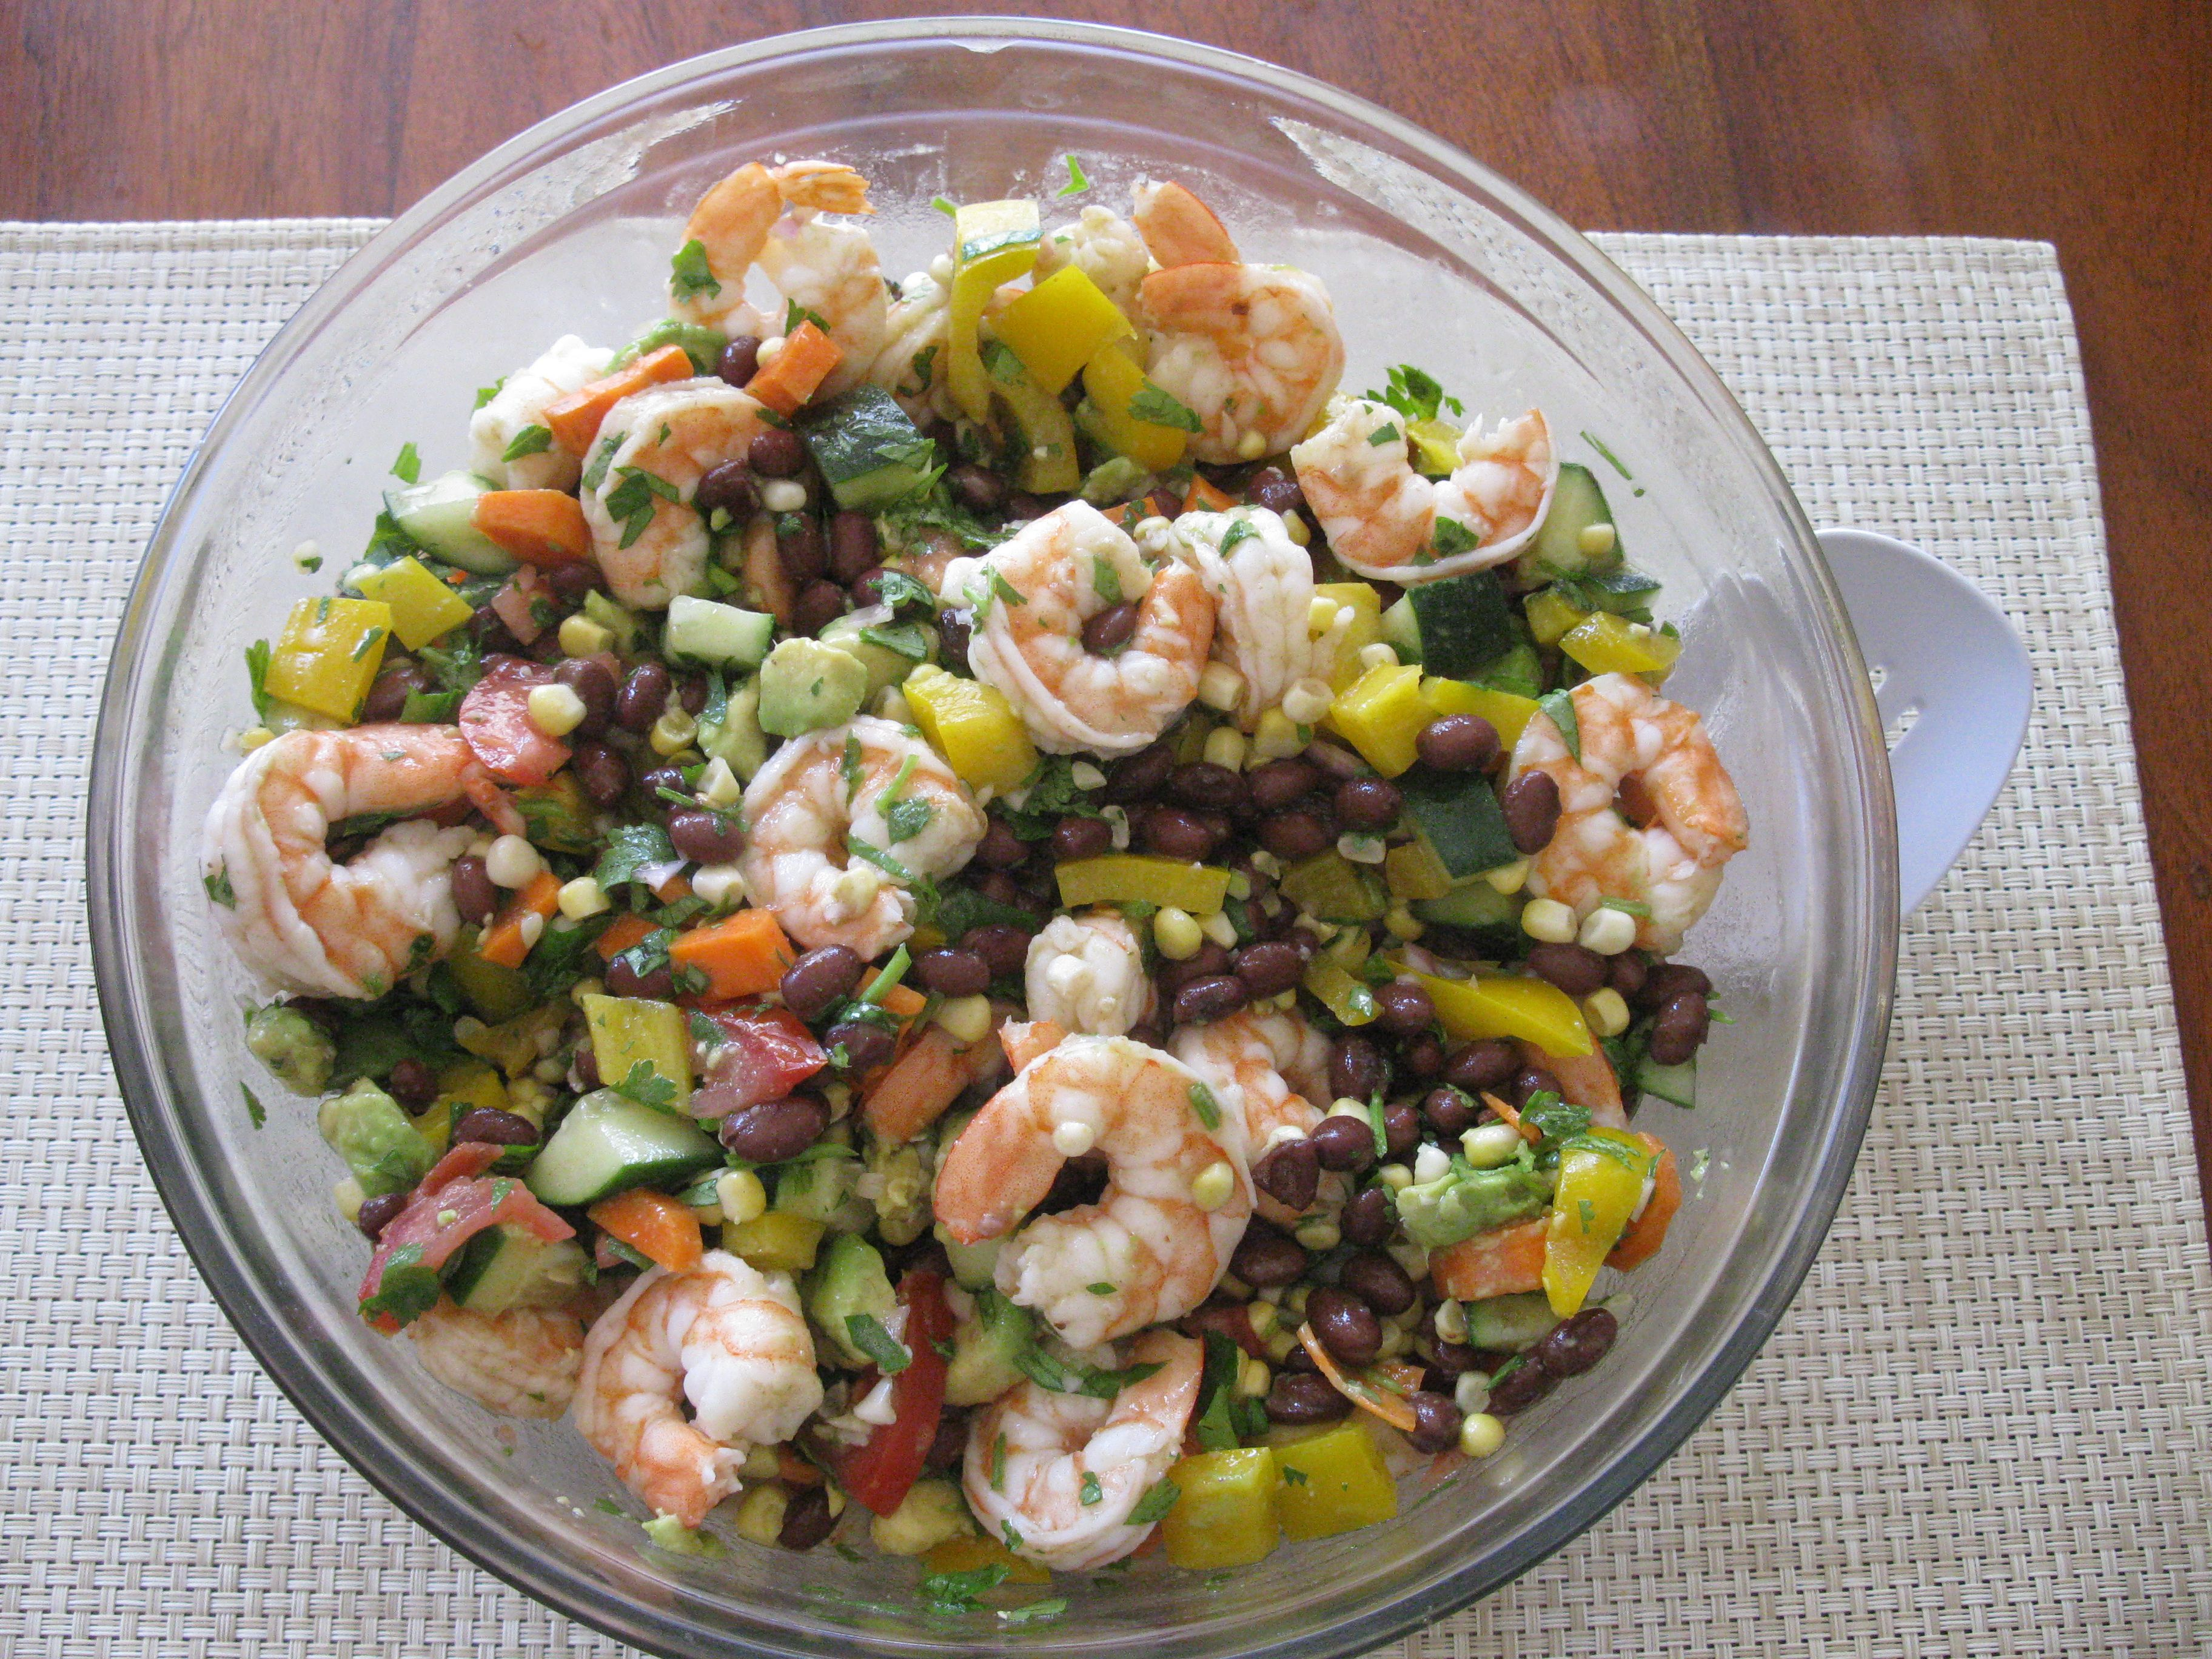 Garlic-Black Pepper Shrimp & Avocado Salad Recipe — Dishmaps